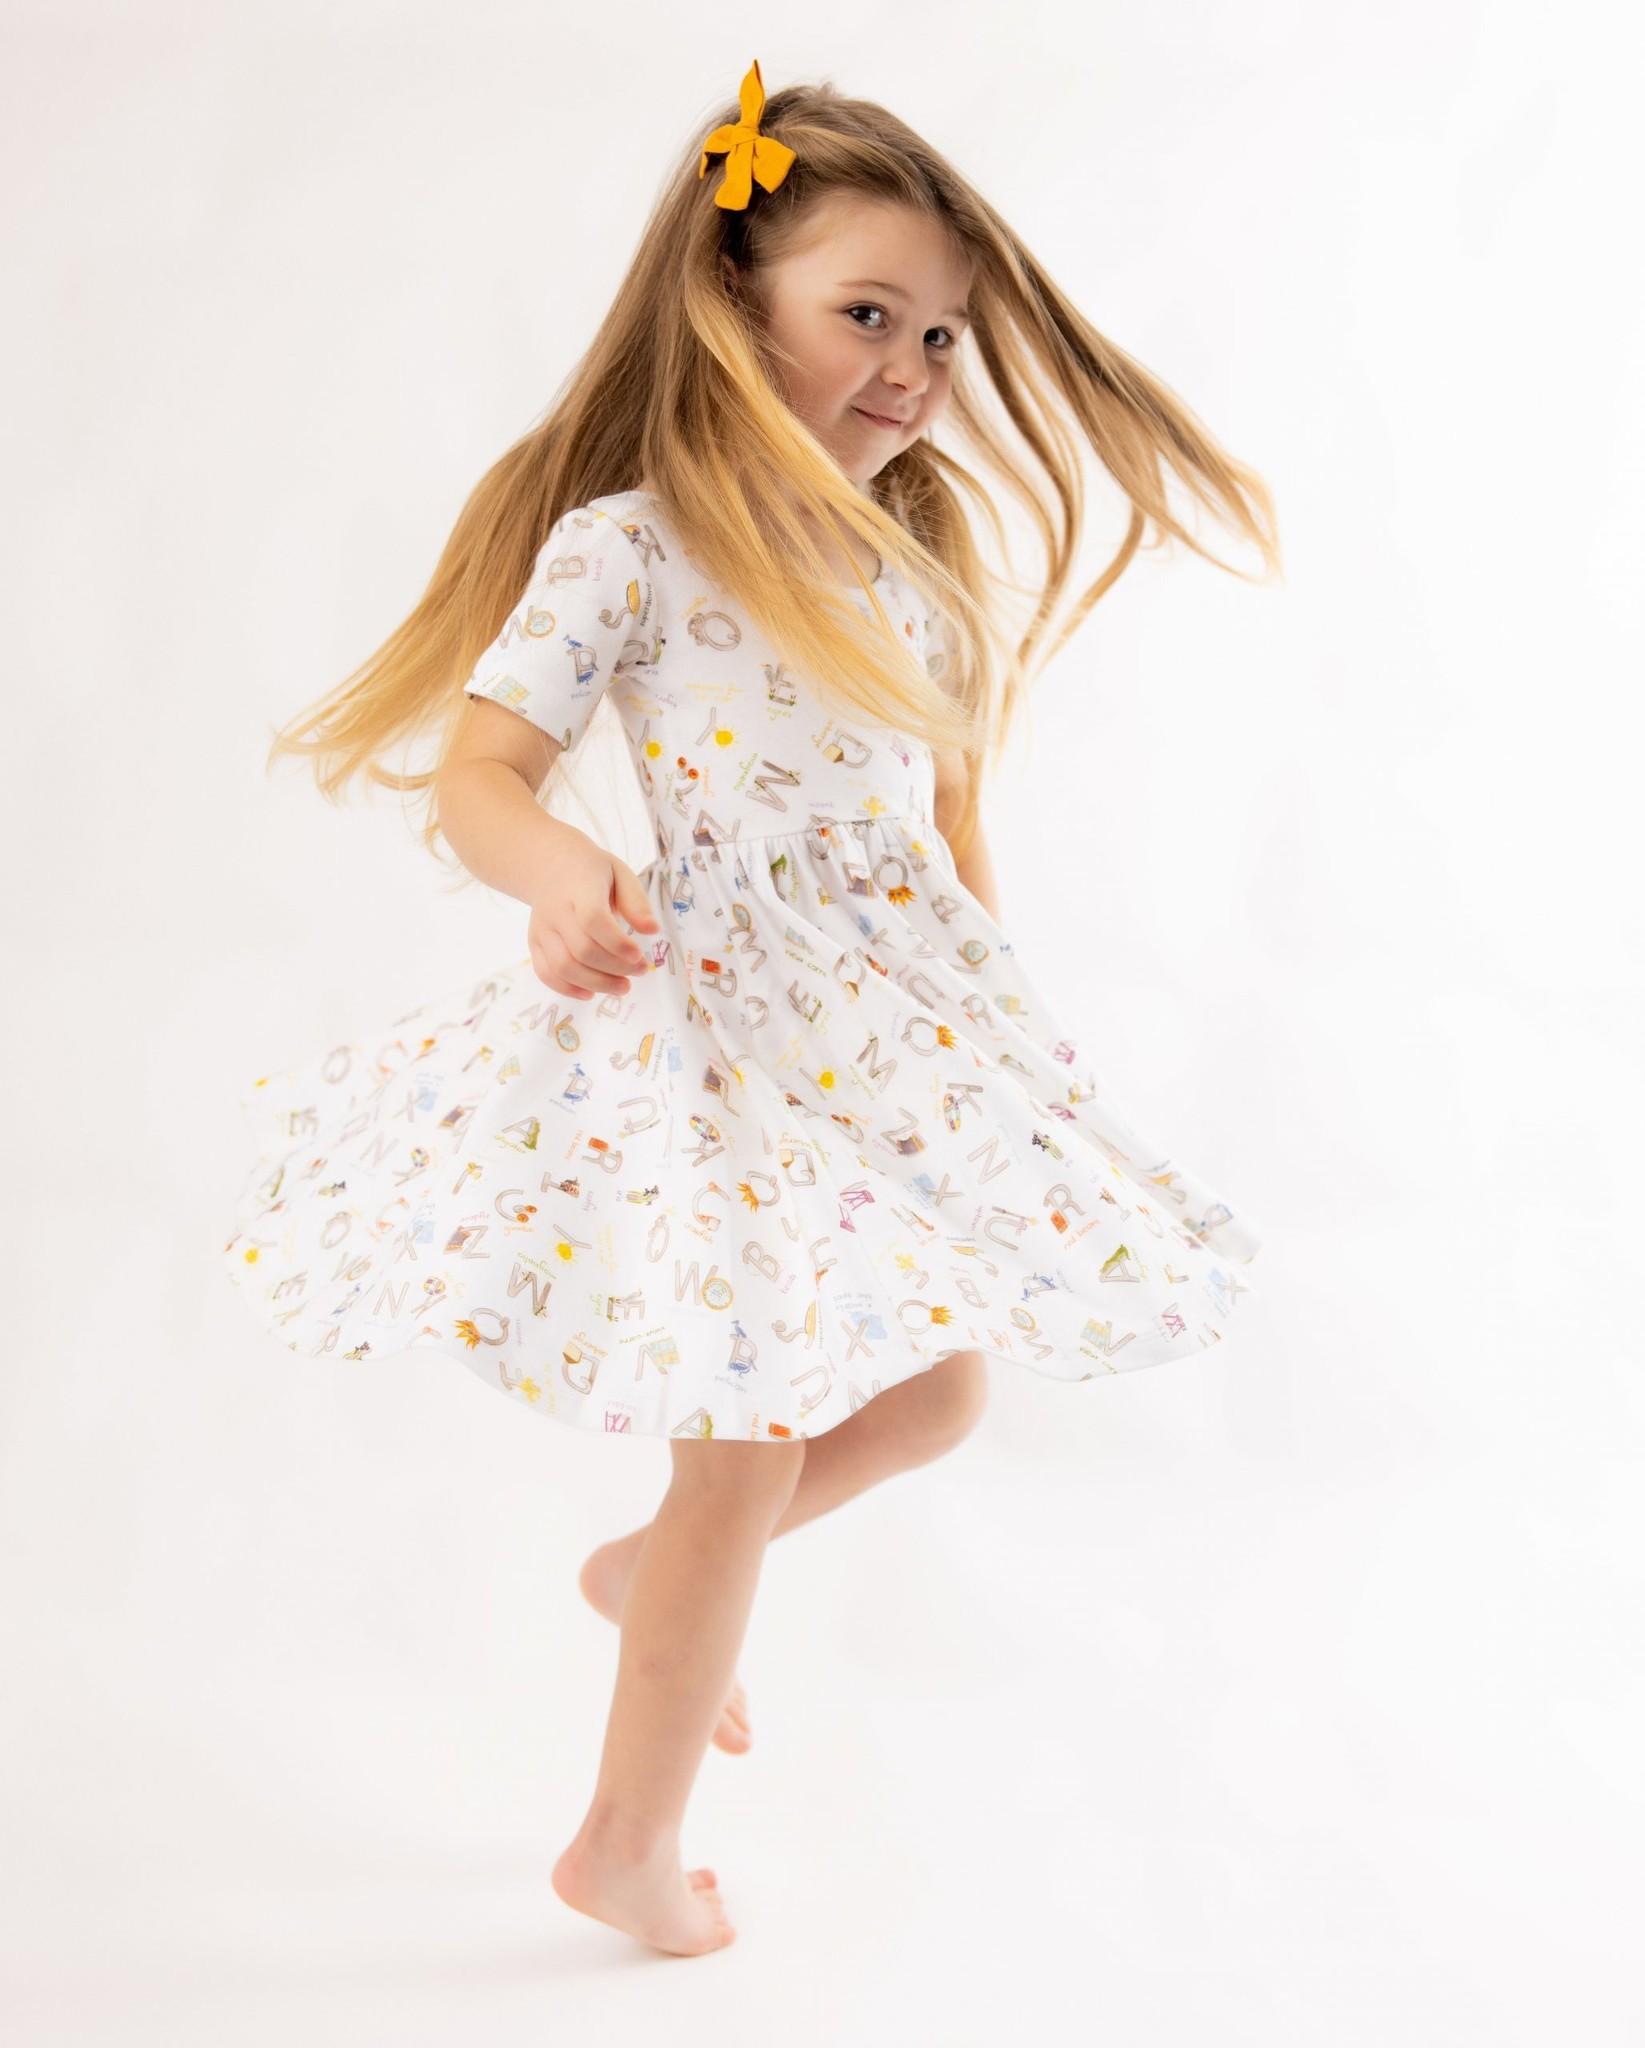 Nola Tawk Louisiana ABC's Organic Cotton Twirl Dress